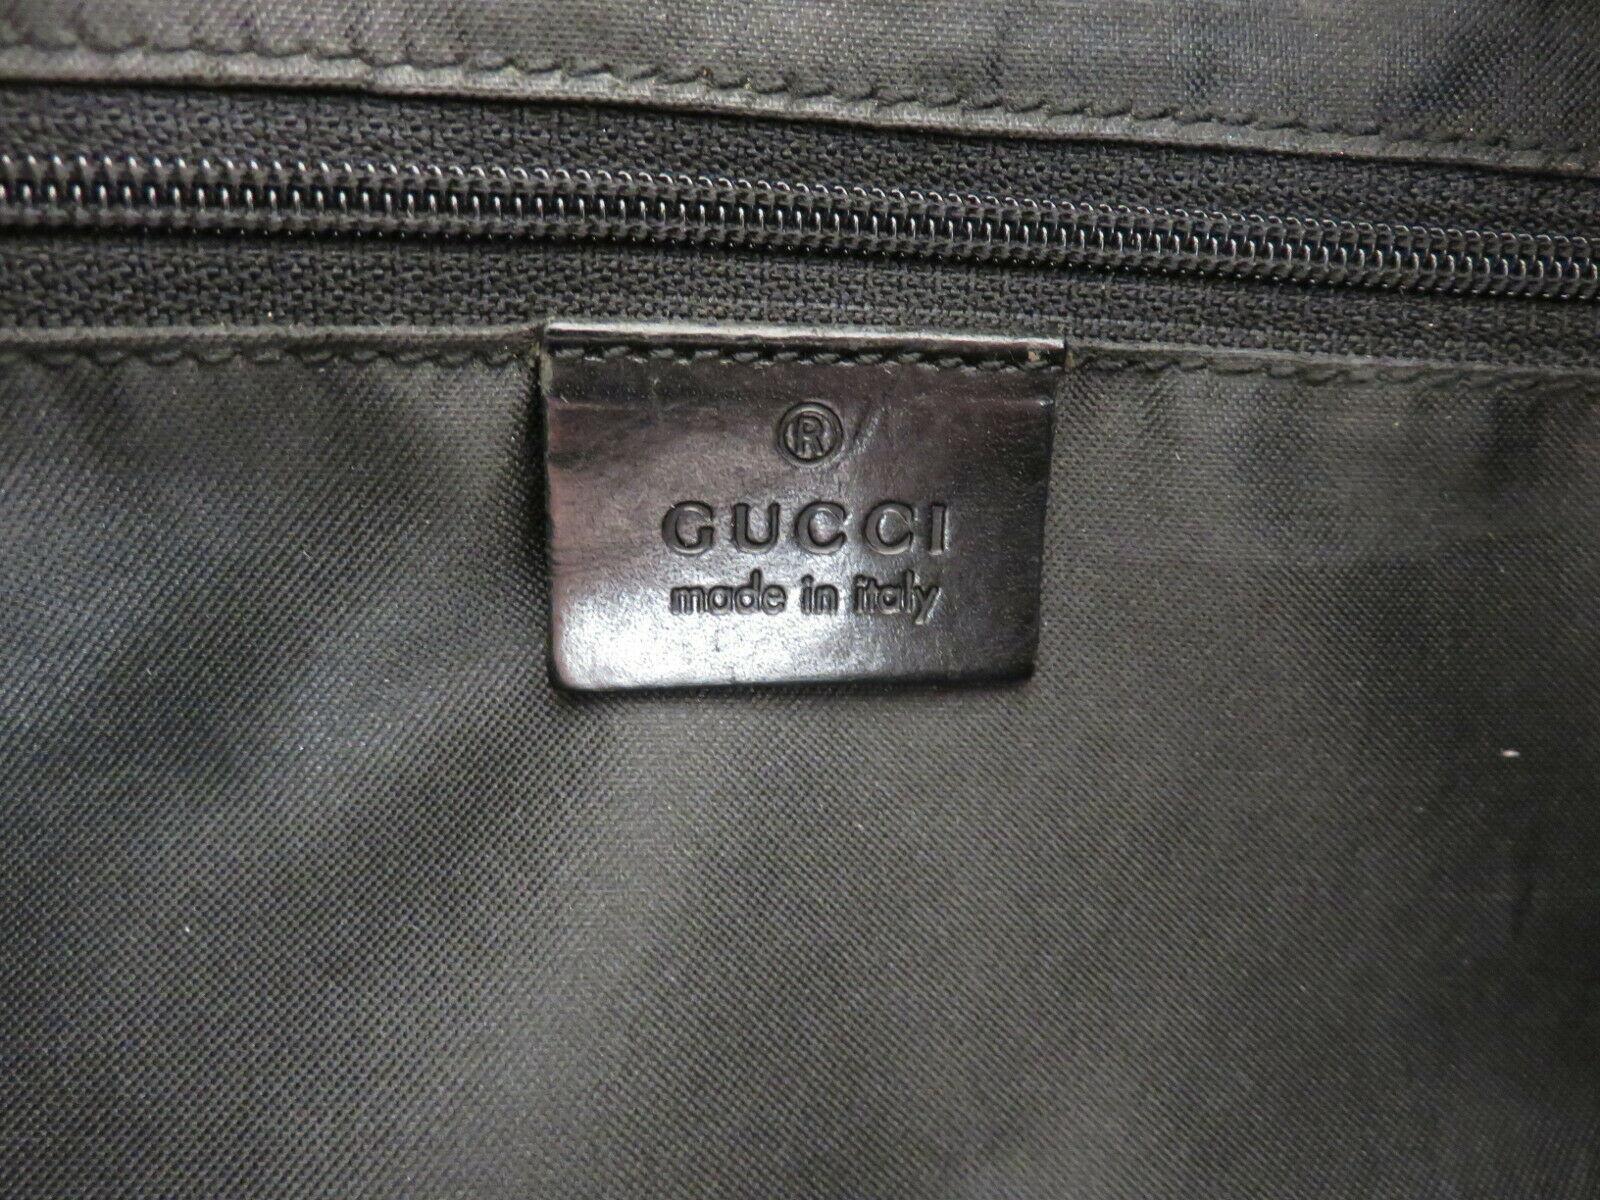 Authentic GUCCI Black Original GG Nylon Leather Shoulder Bag Purse